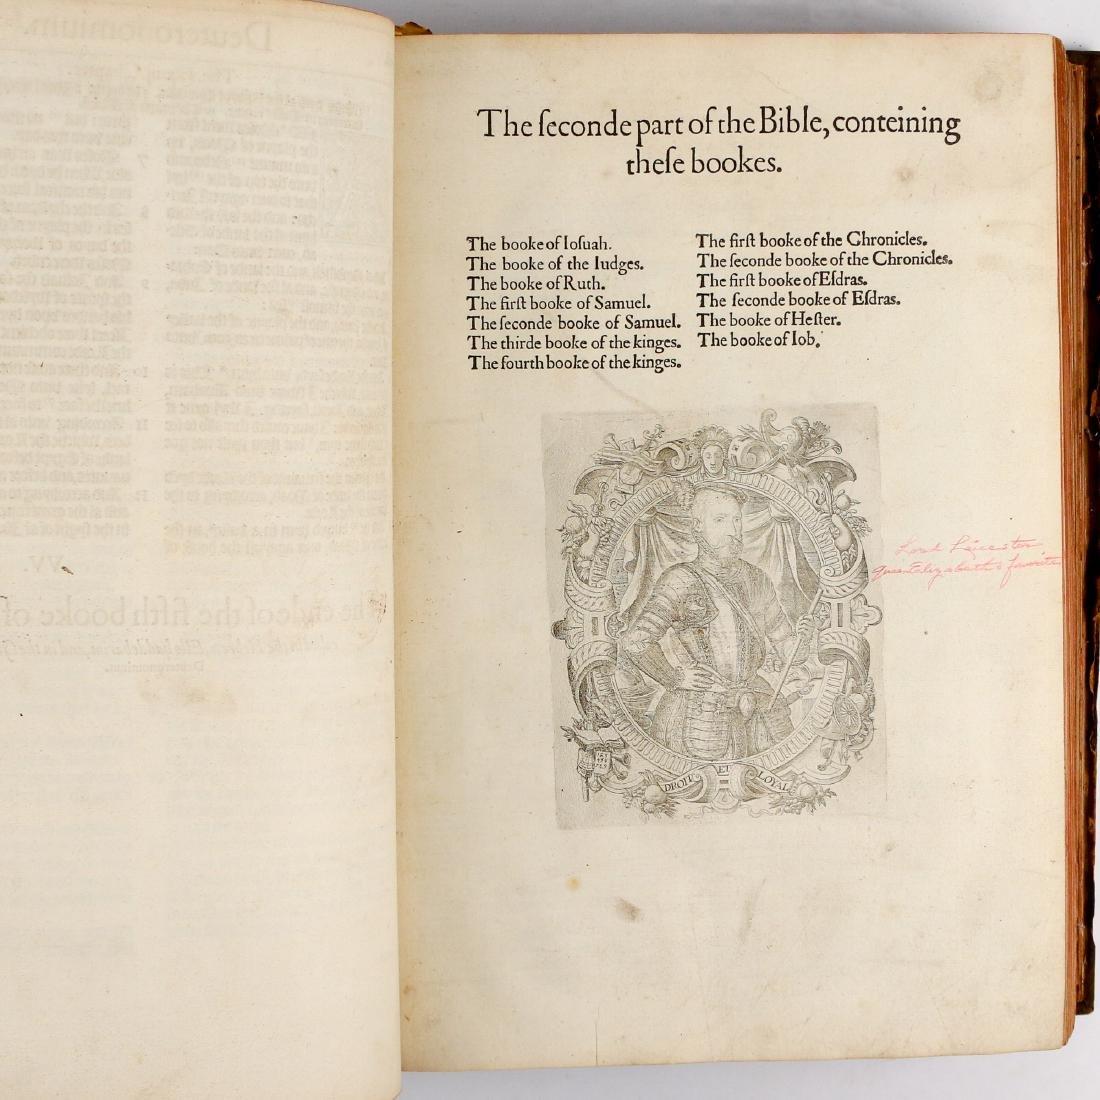 [FRANCIS FRY COPY] BISHOPS' BIBLE [1572] - 18